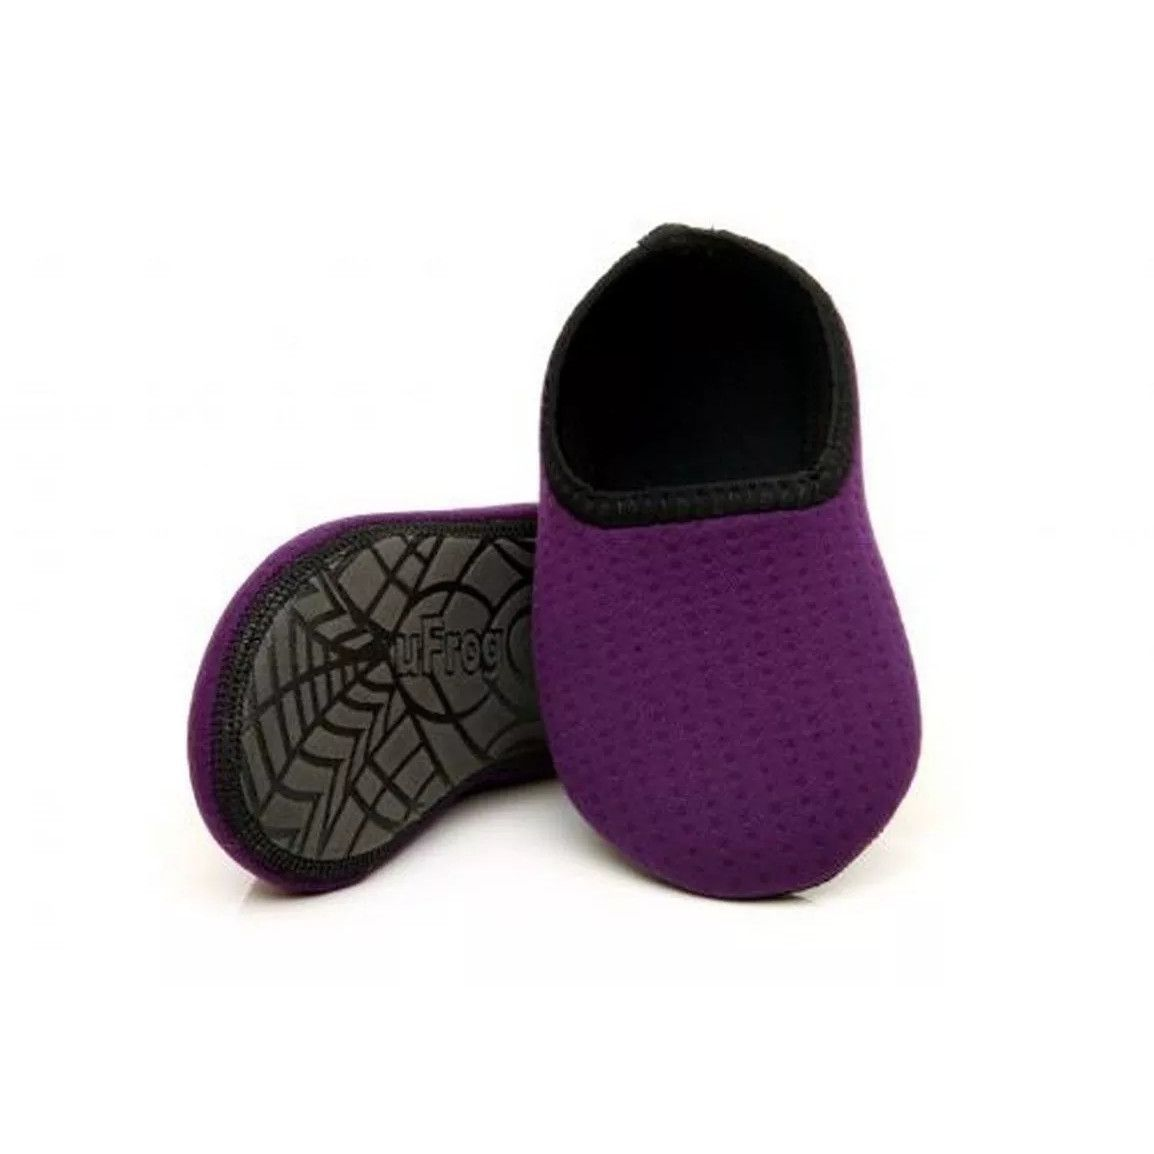 Sapato de Neoprene Adulto Fit Roxo Ufrog